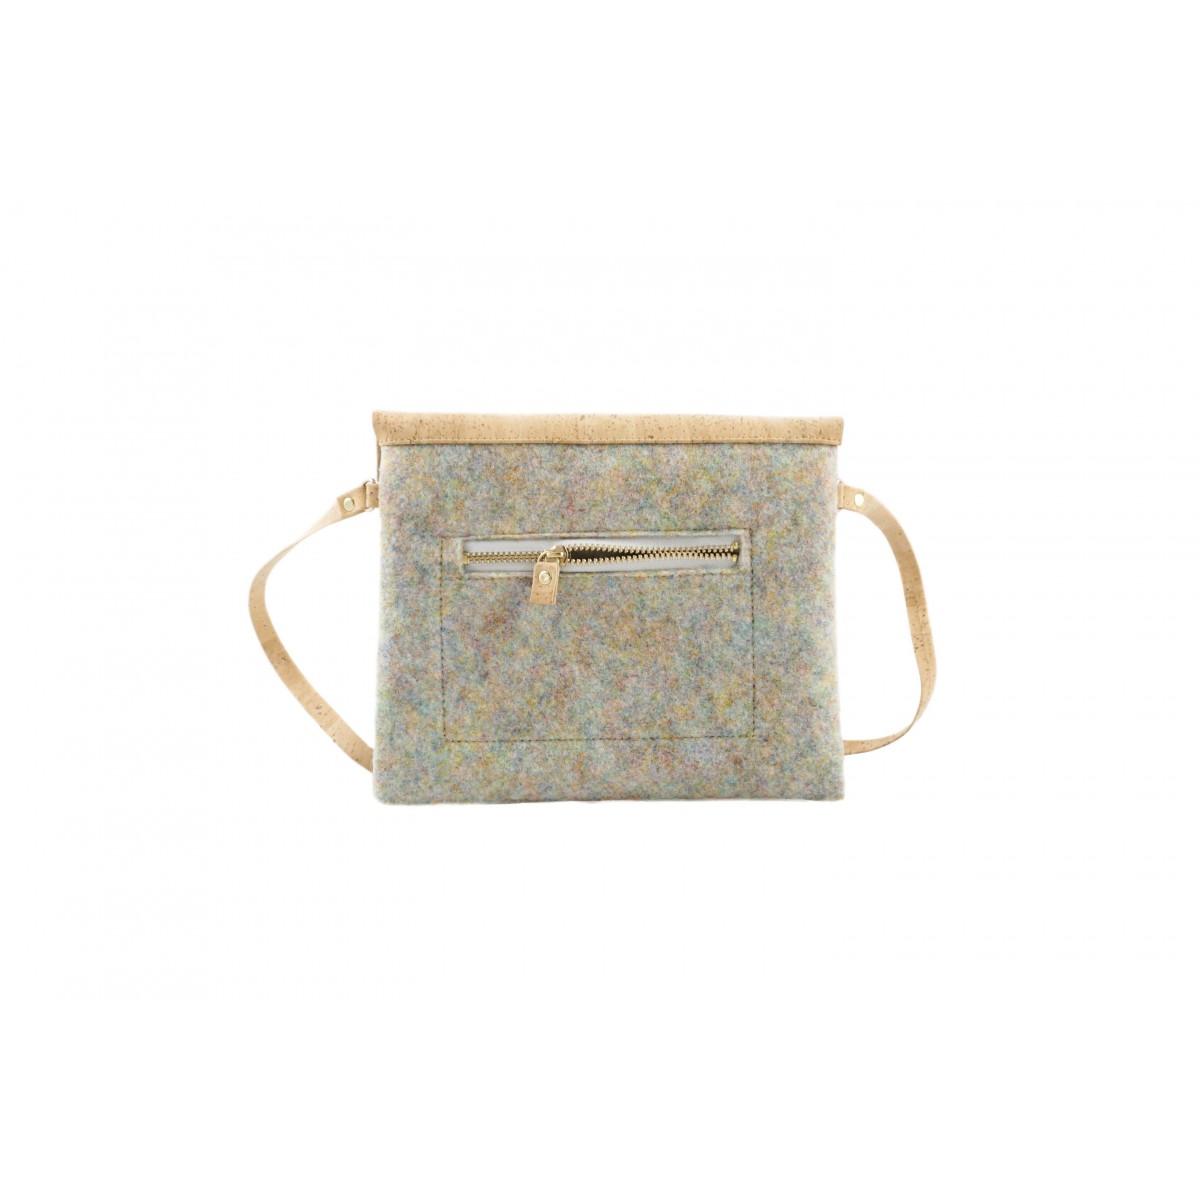 MARILA Handtasche Quadratisch Grau Natur Kork vegan